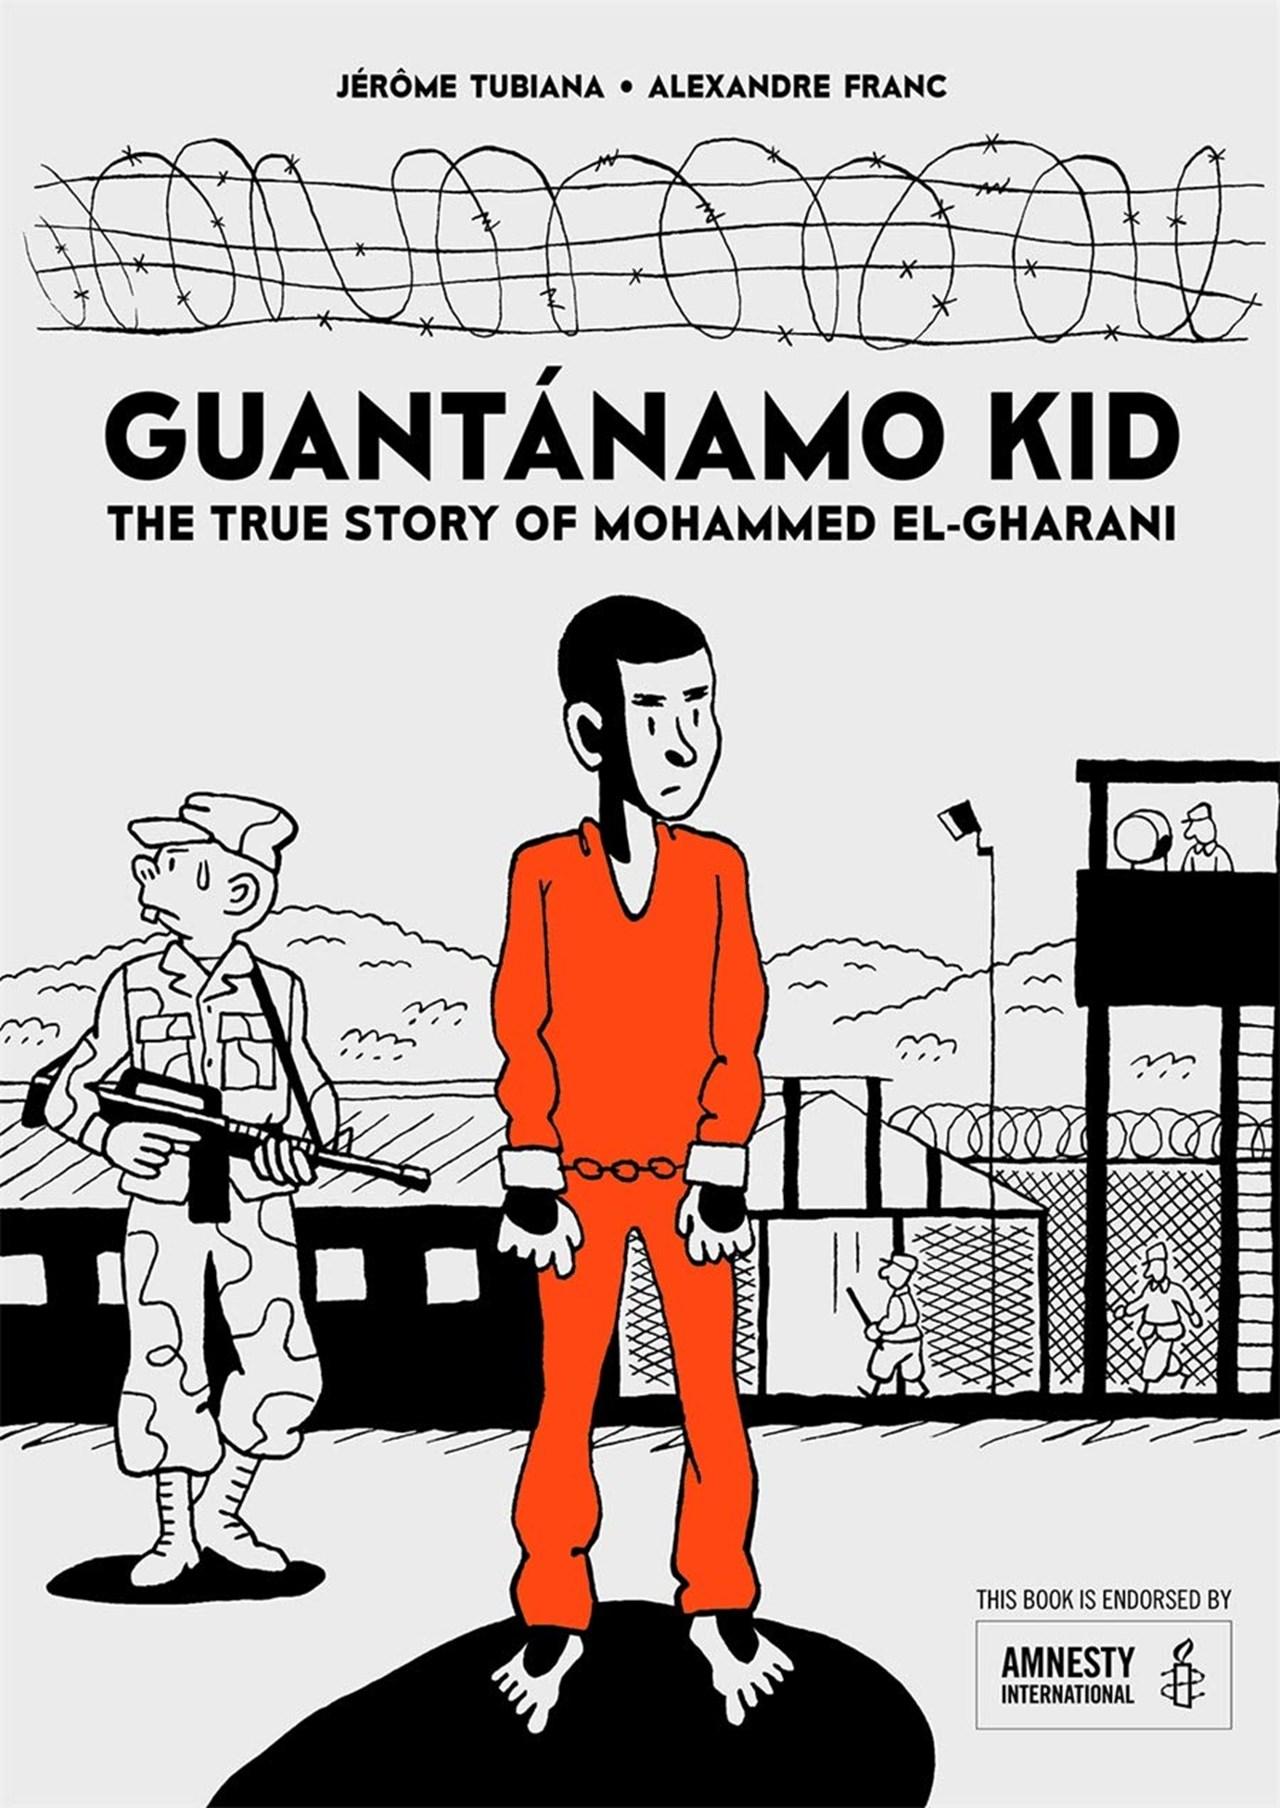 Guantanamo Kid: The True Story of Mohammed El-Gharani - 1